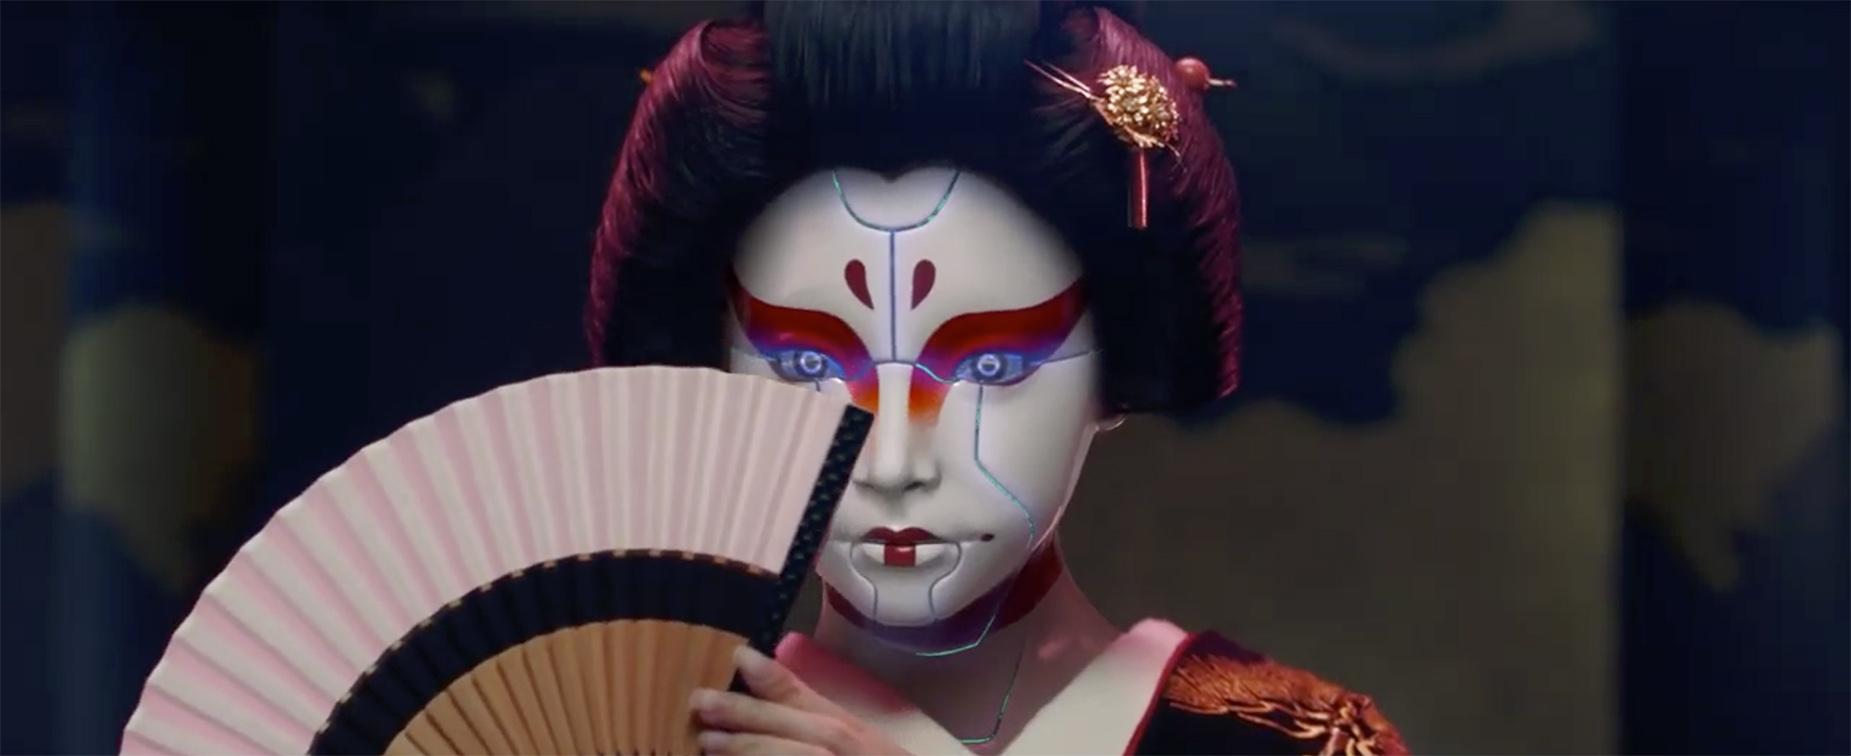 Toshiba's new global campaign via Stig&Xi China brings back the Takumi spirit